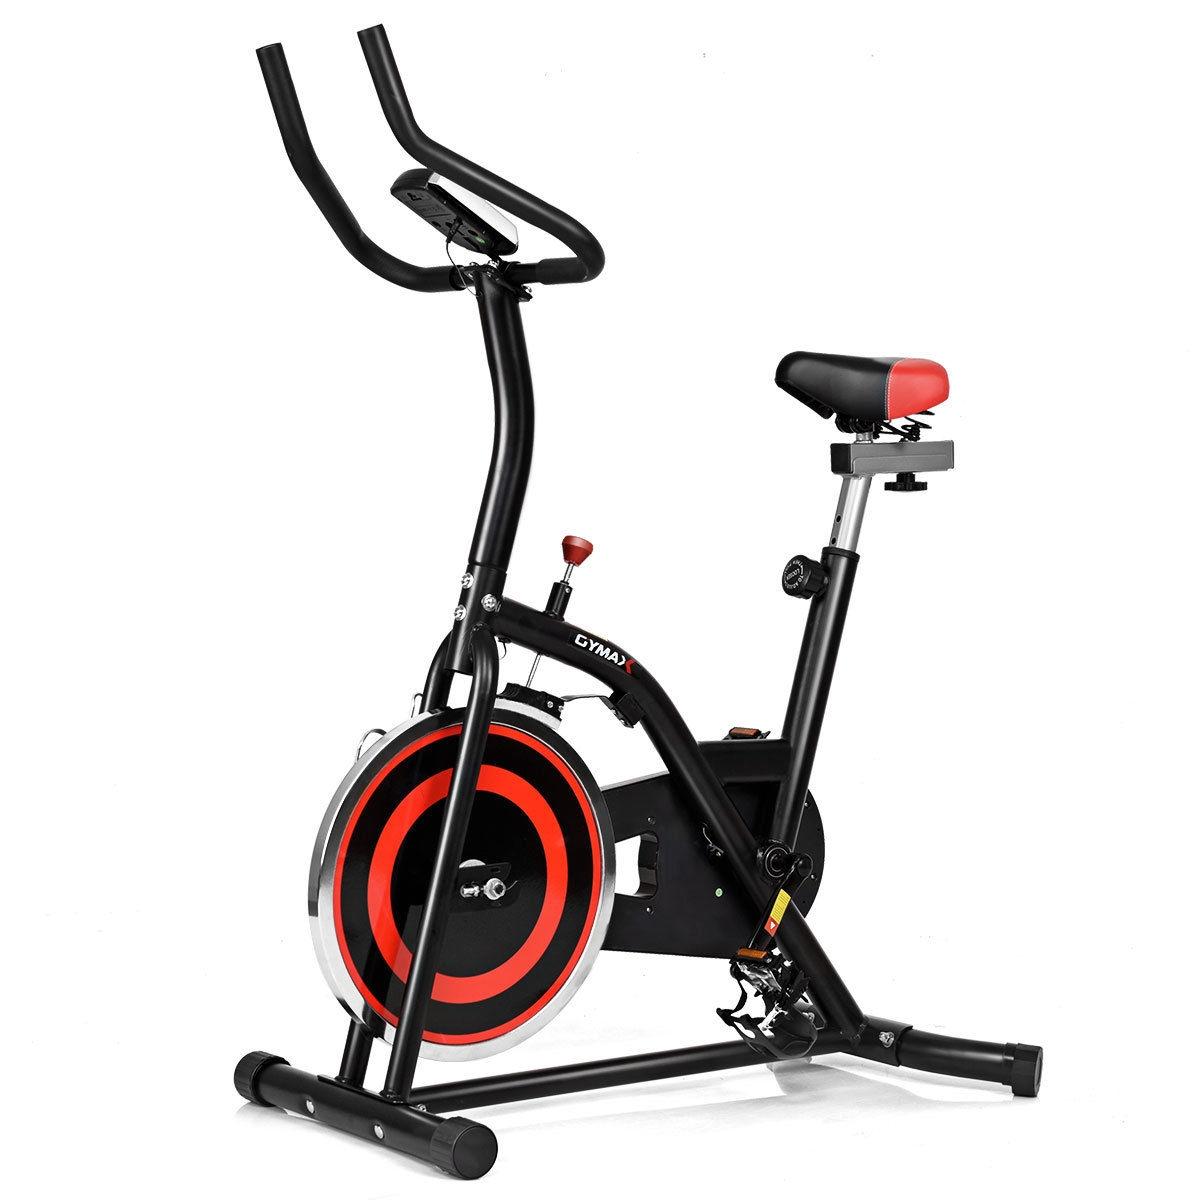 Indoor Cardio Fitness Stationary Exercise Bike